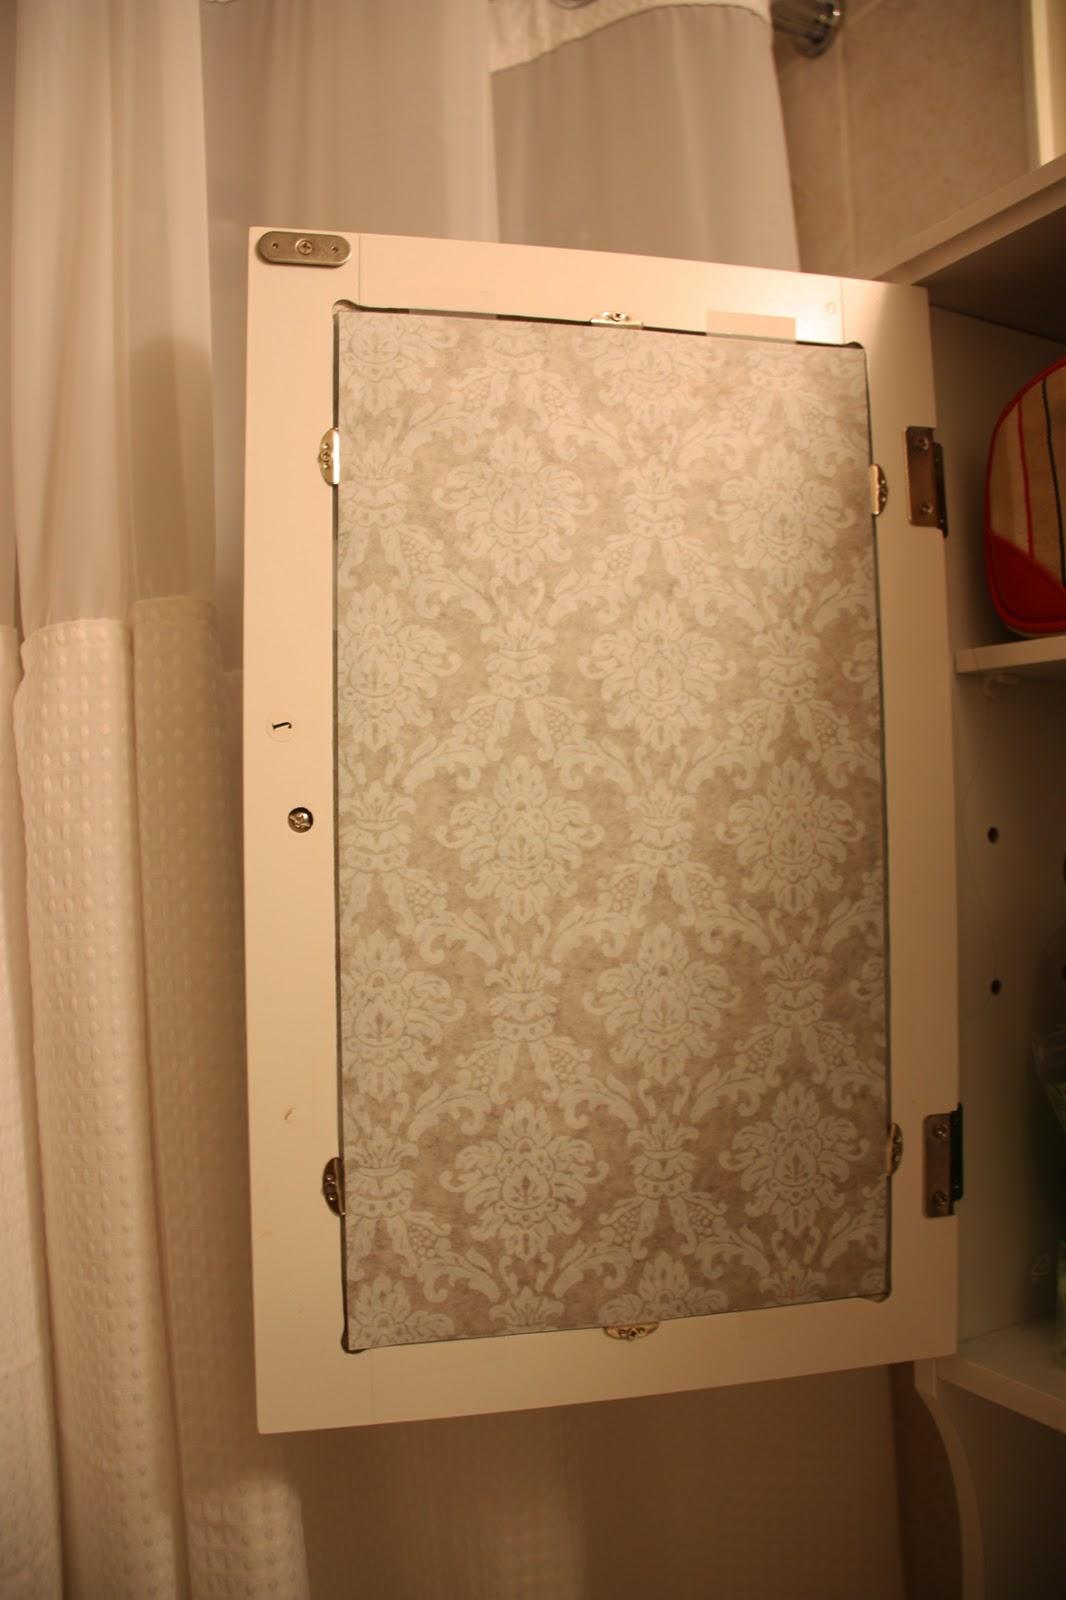 Betty trieu designs diy easy glass cabinet door face lift for Diy glass kitchen cabinet doors